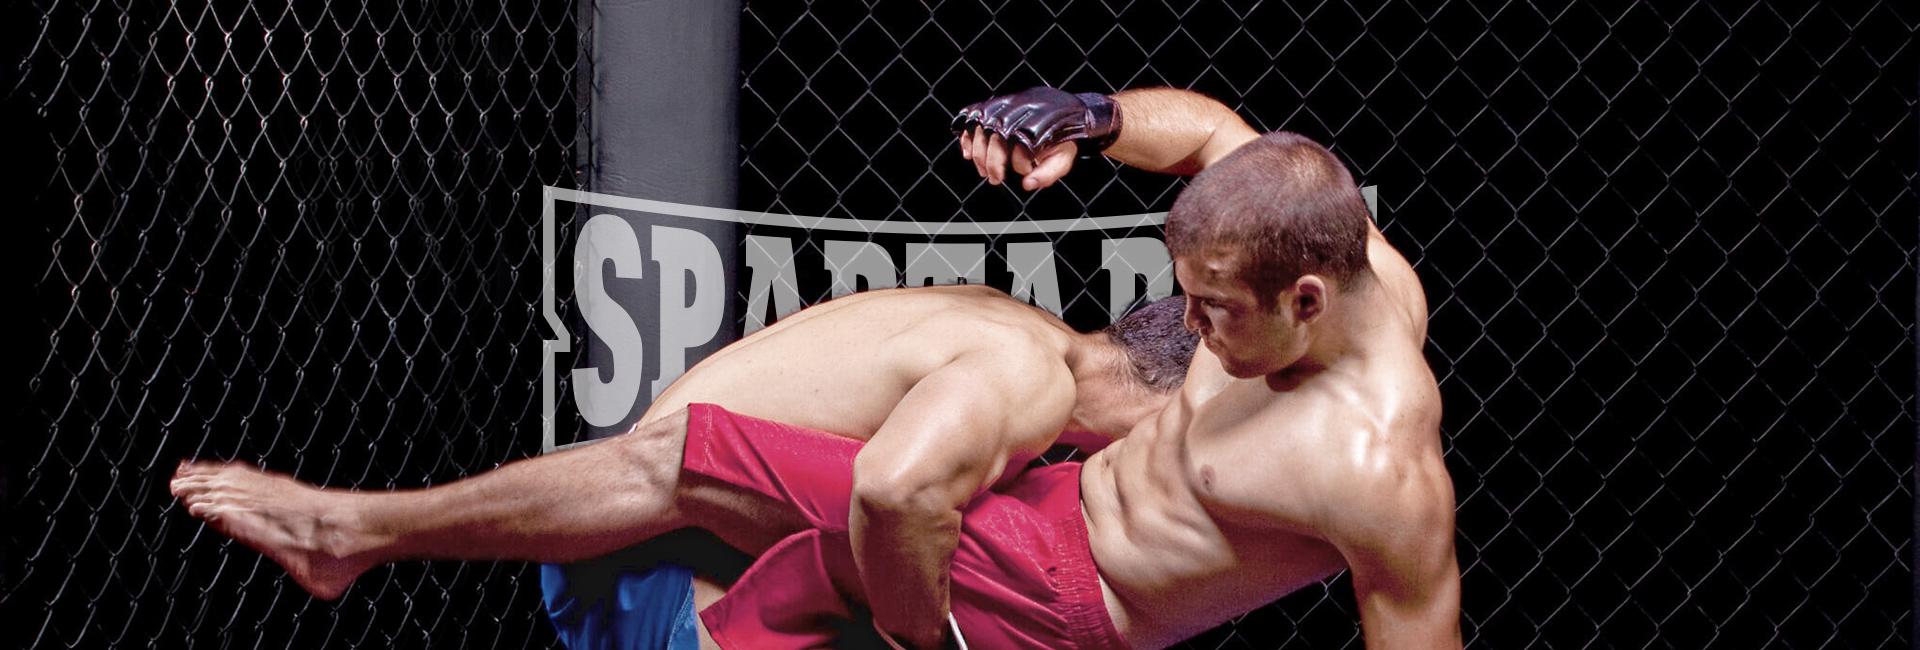 SpartaBox: MMA